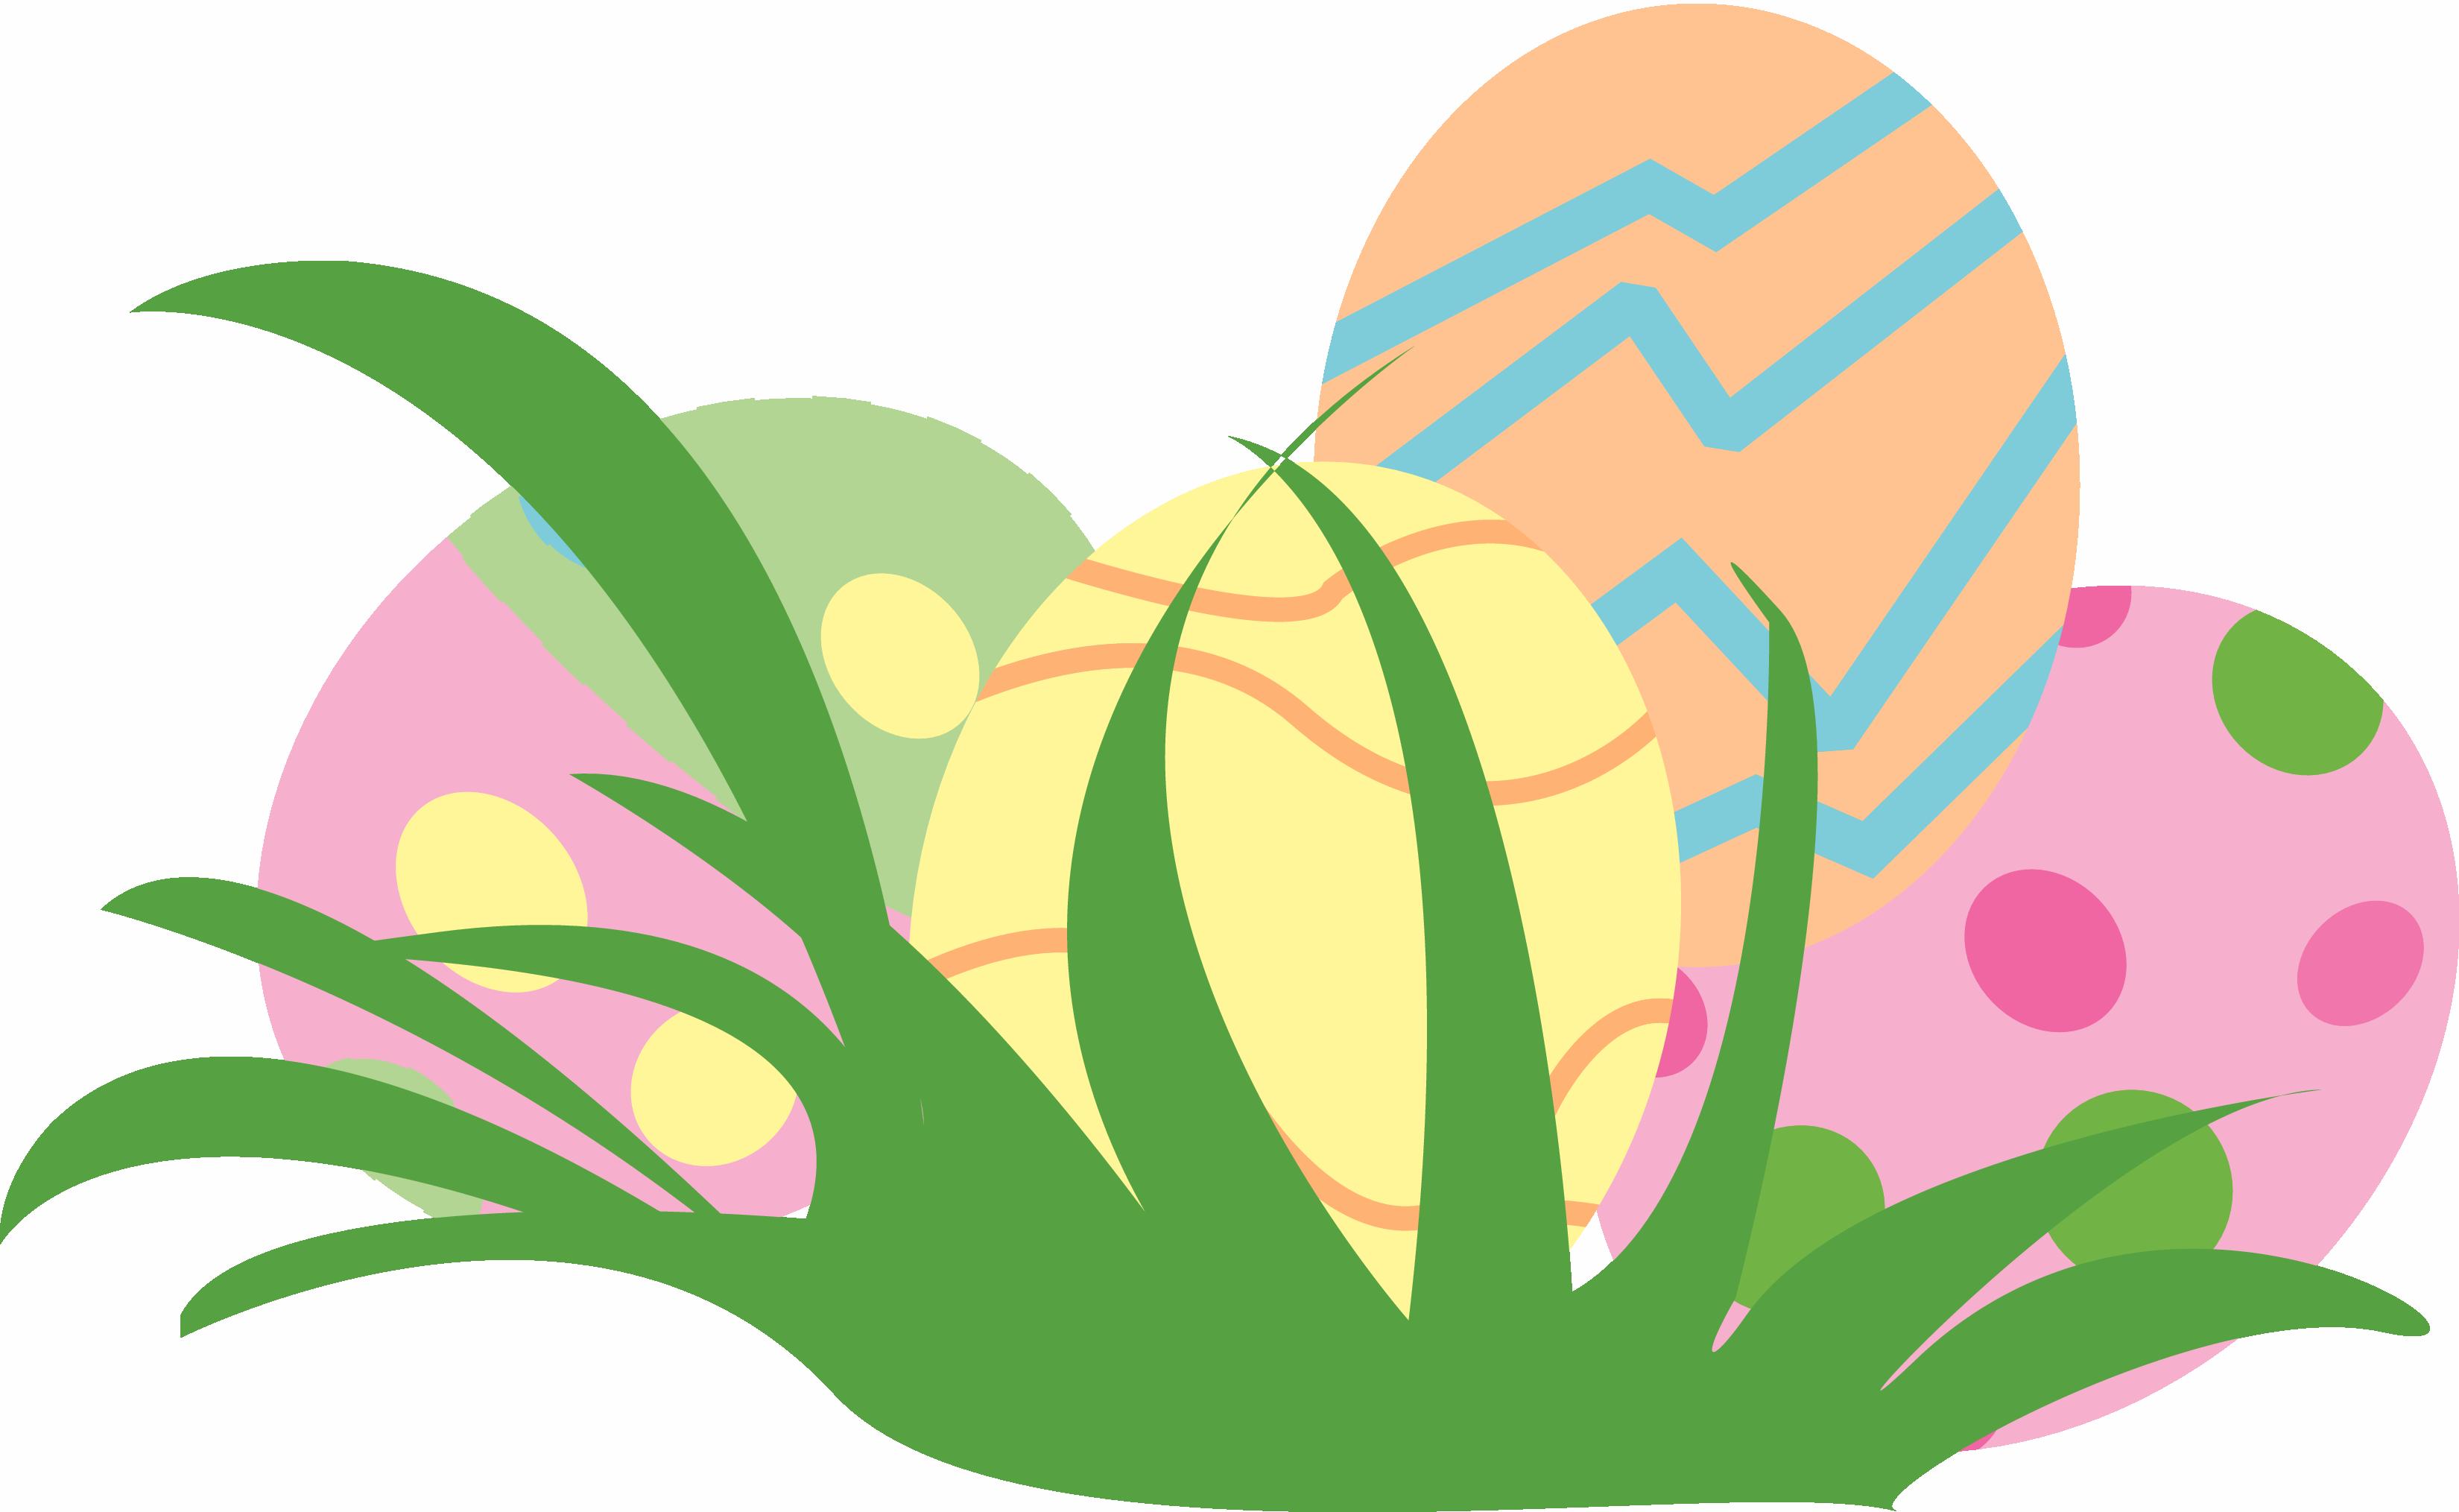 Free egg clip art easter eggs clipart image - Clipartix